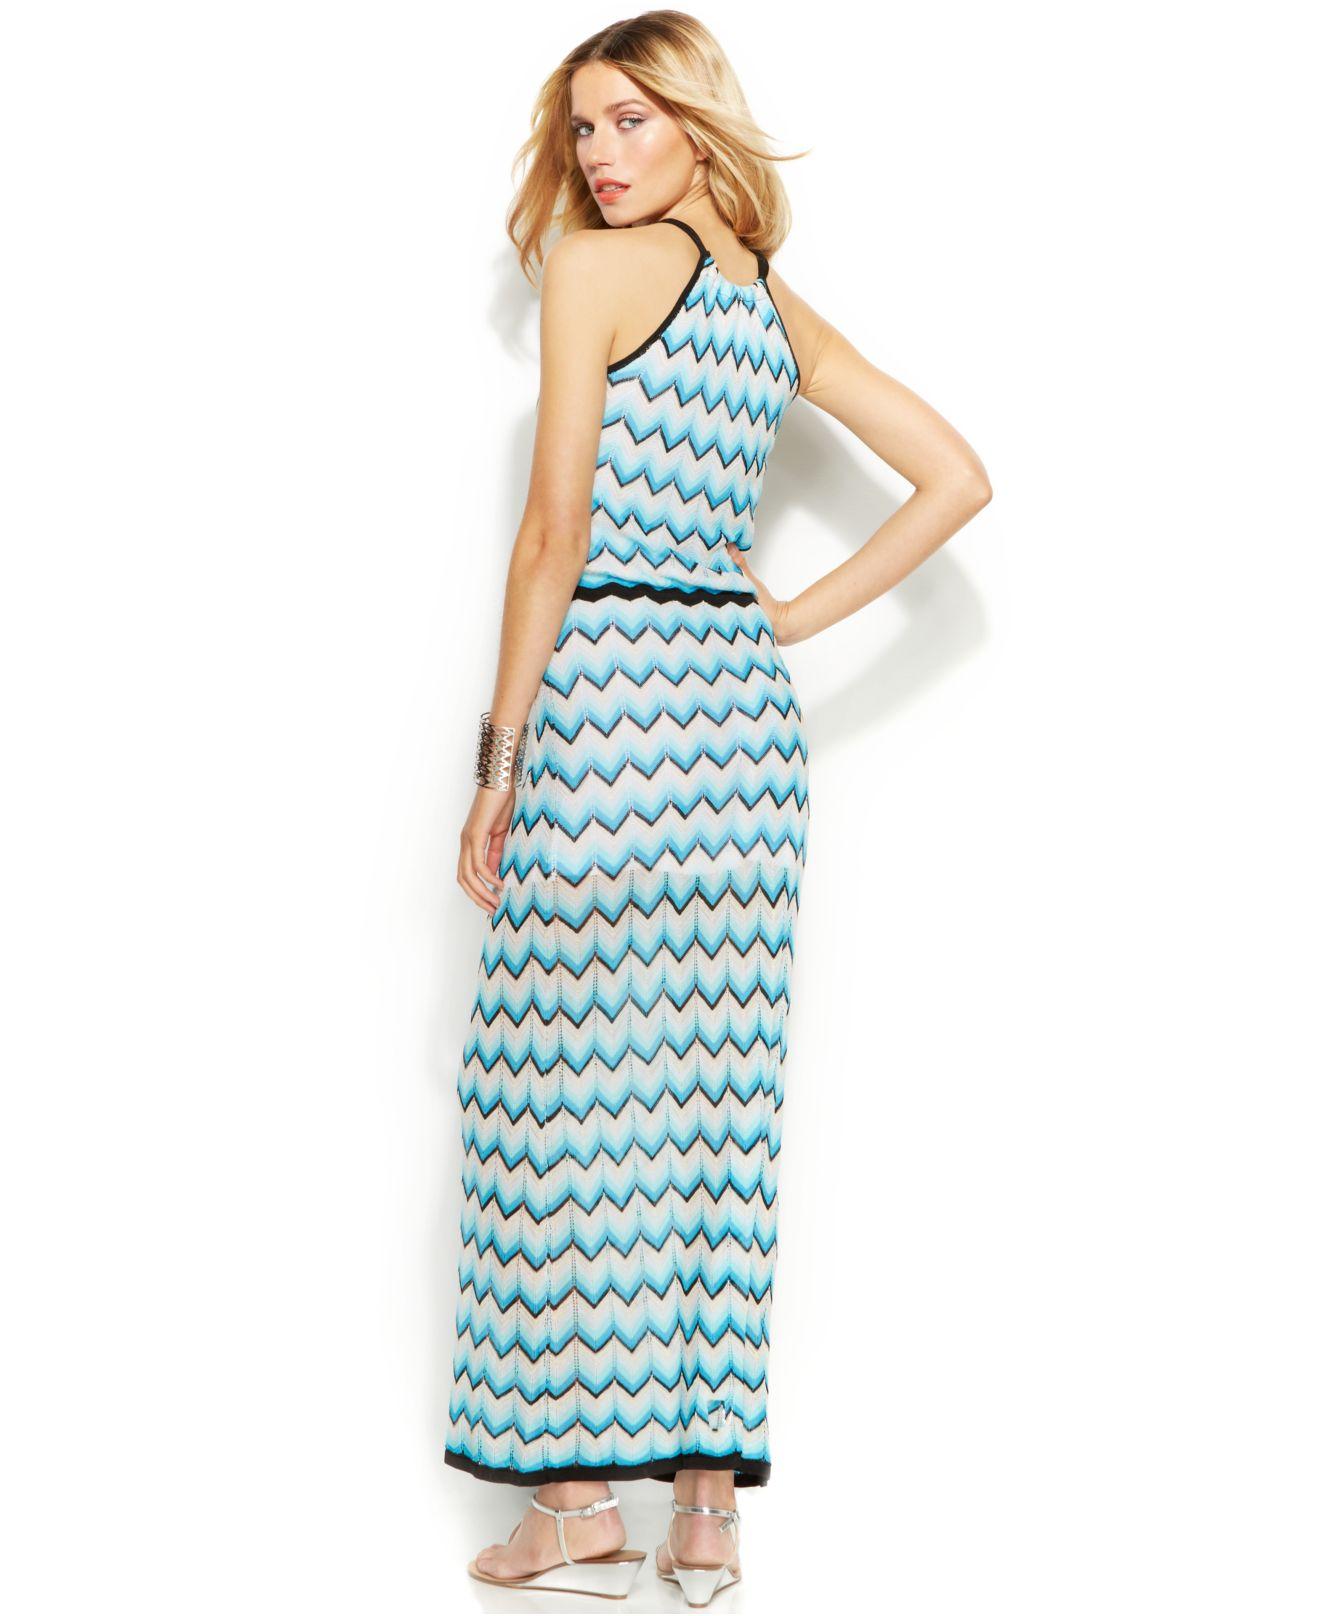 Lyst - Inc International Concepts Chevron-Knit Halter Maxi Dress in Blue